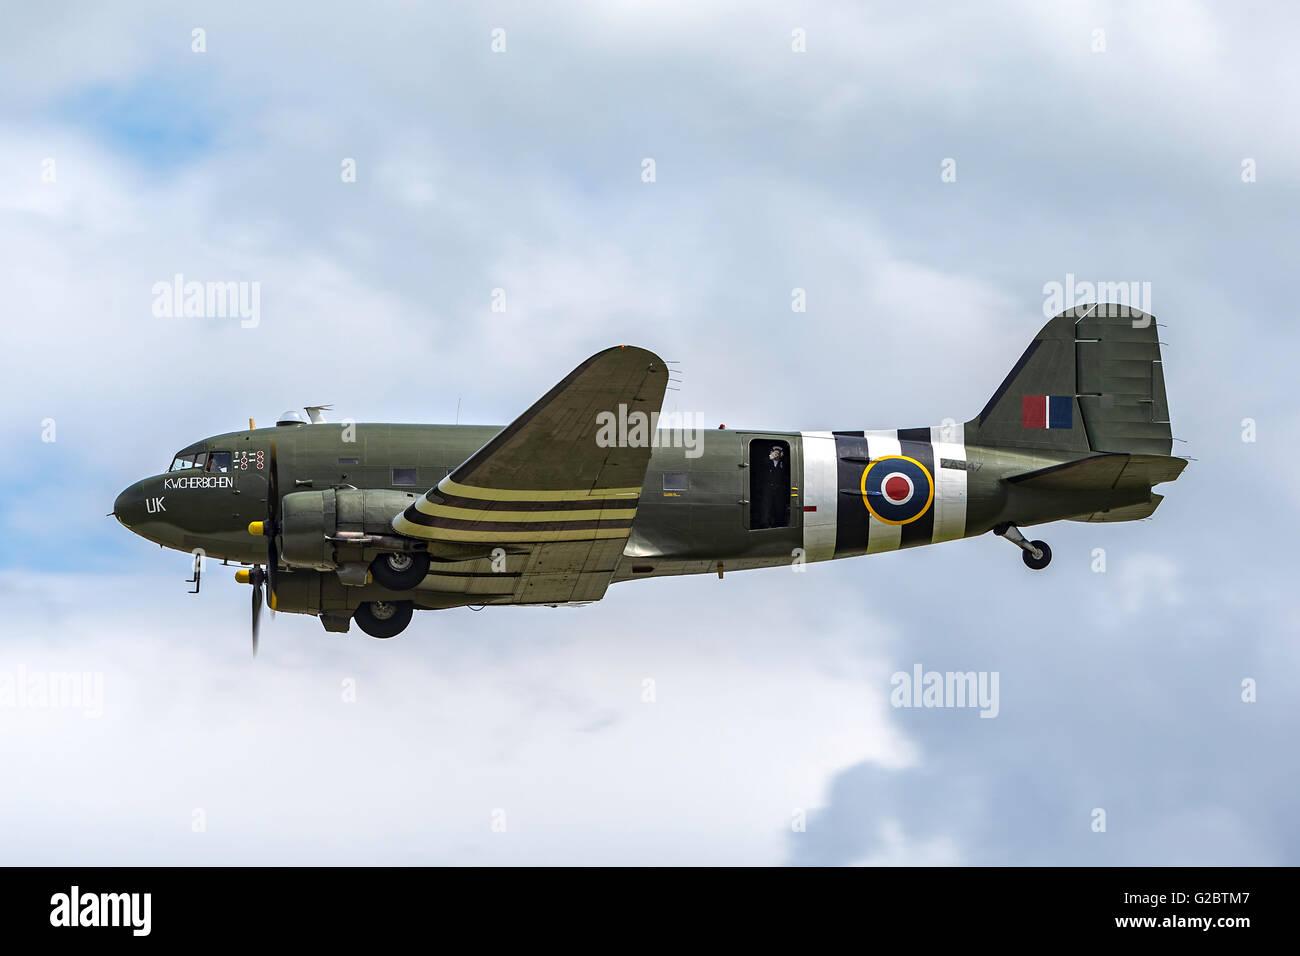 Douglas C-47 Dakota transport aircraft from the Royal Air